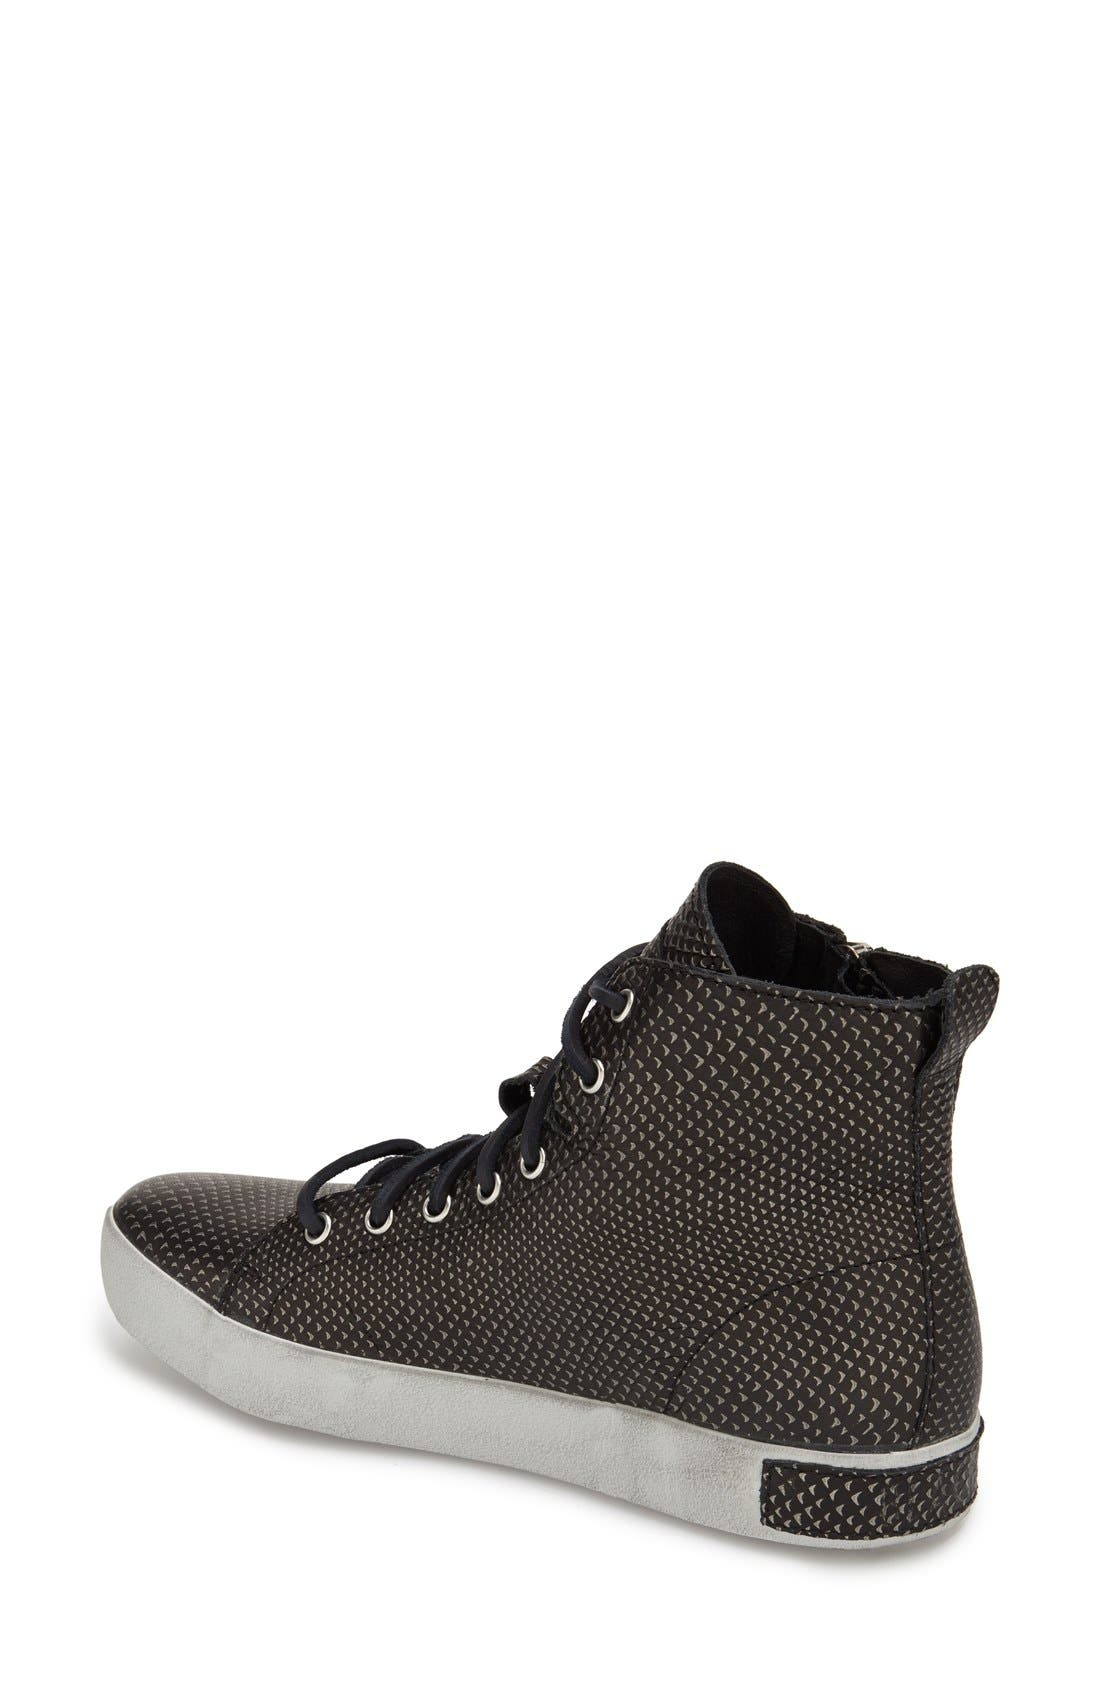 'KL57' High Top Sneaker,                             Alternate thumbnail 2, color,                             Black Metallic Leather